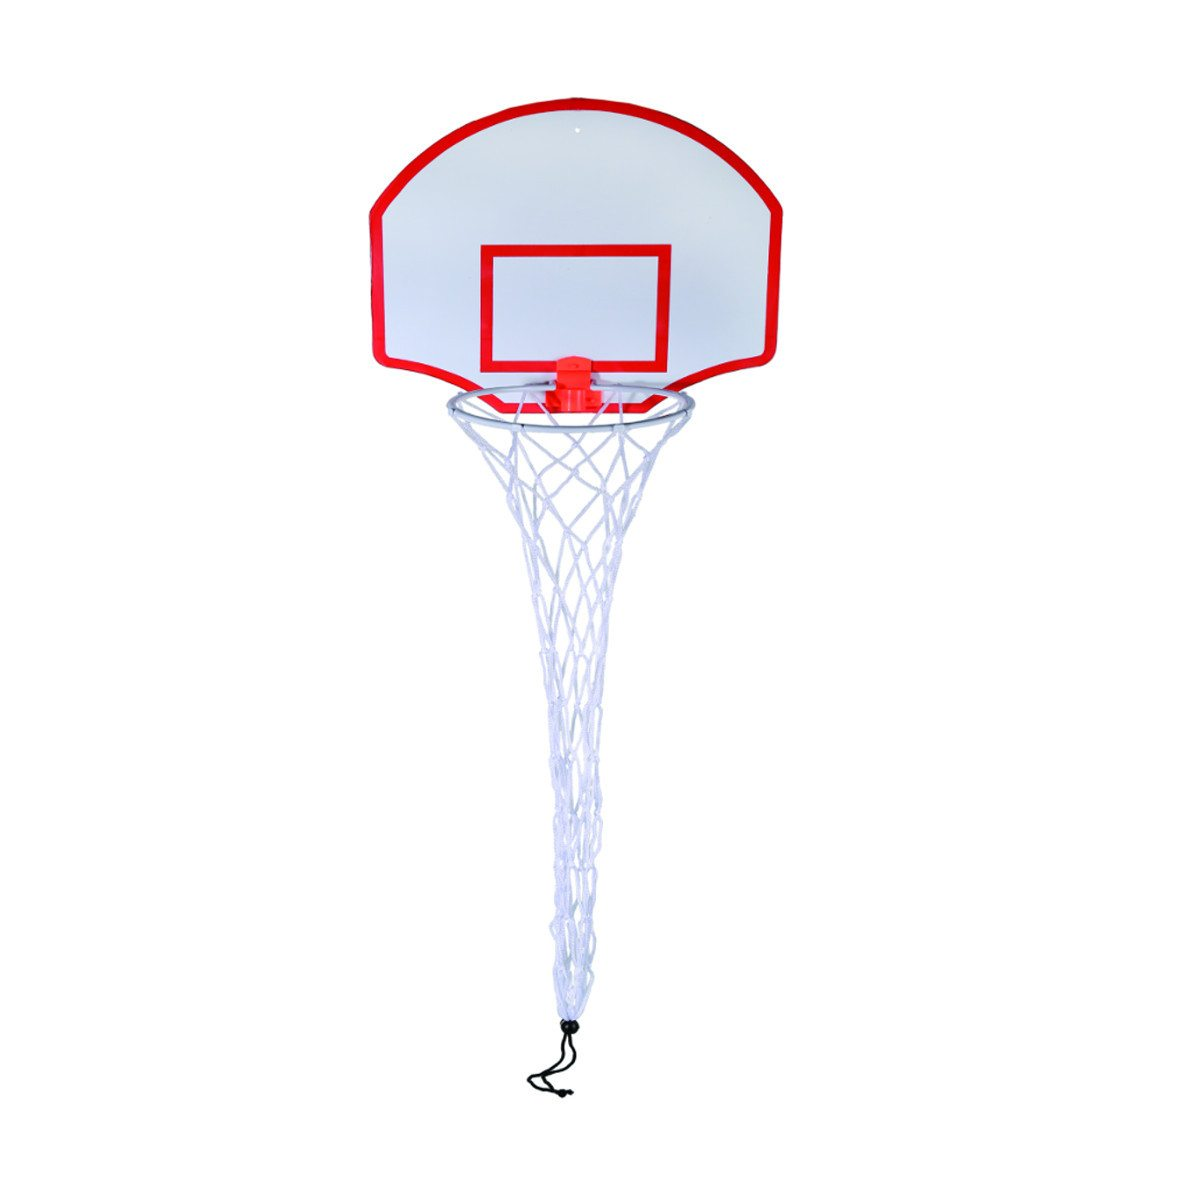 Vasketøjskurv formet som en basketballkurv